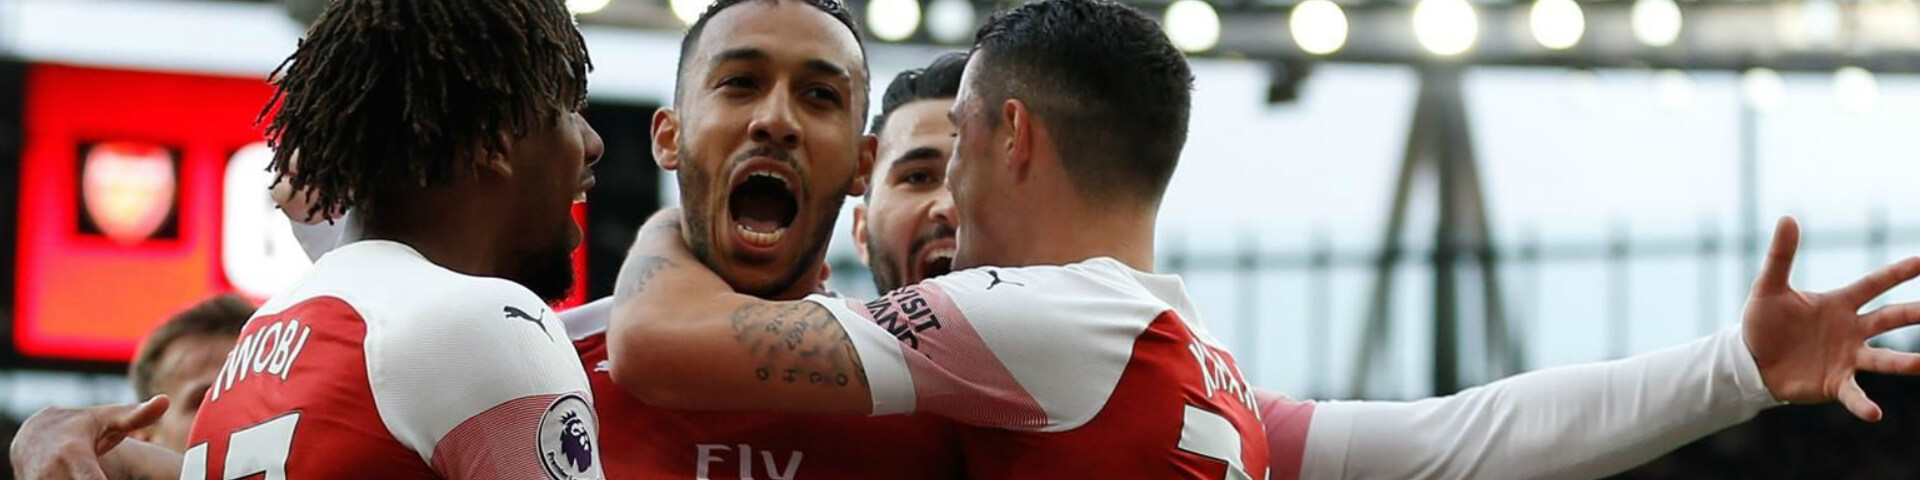 Букмекеры: «Арсенал» обыграет «Ньюкасл»